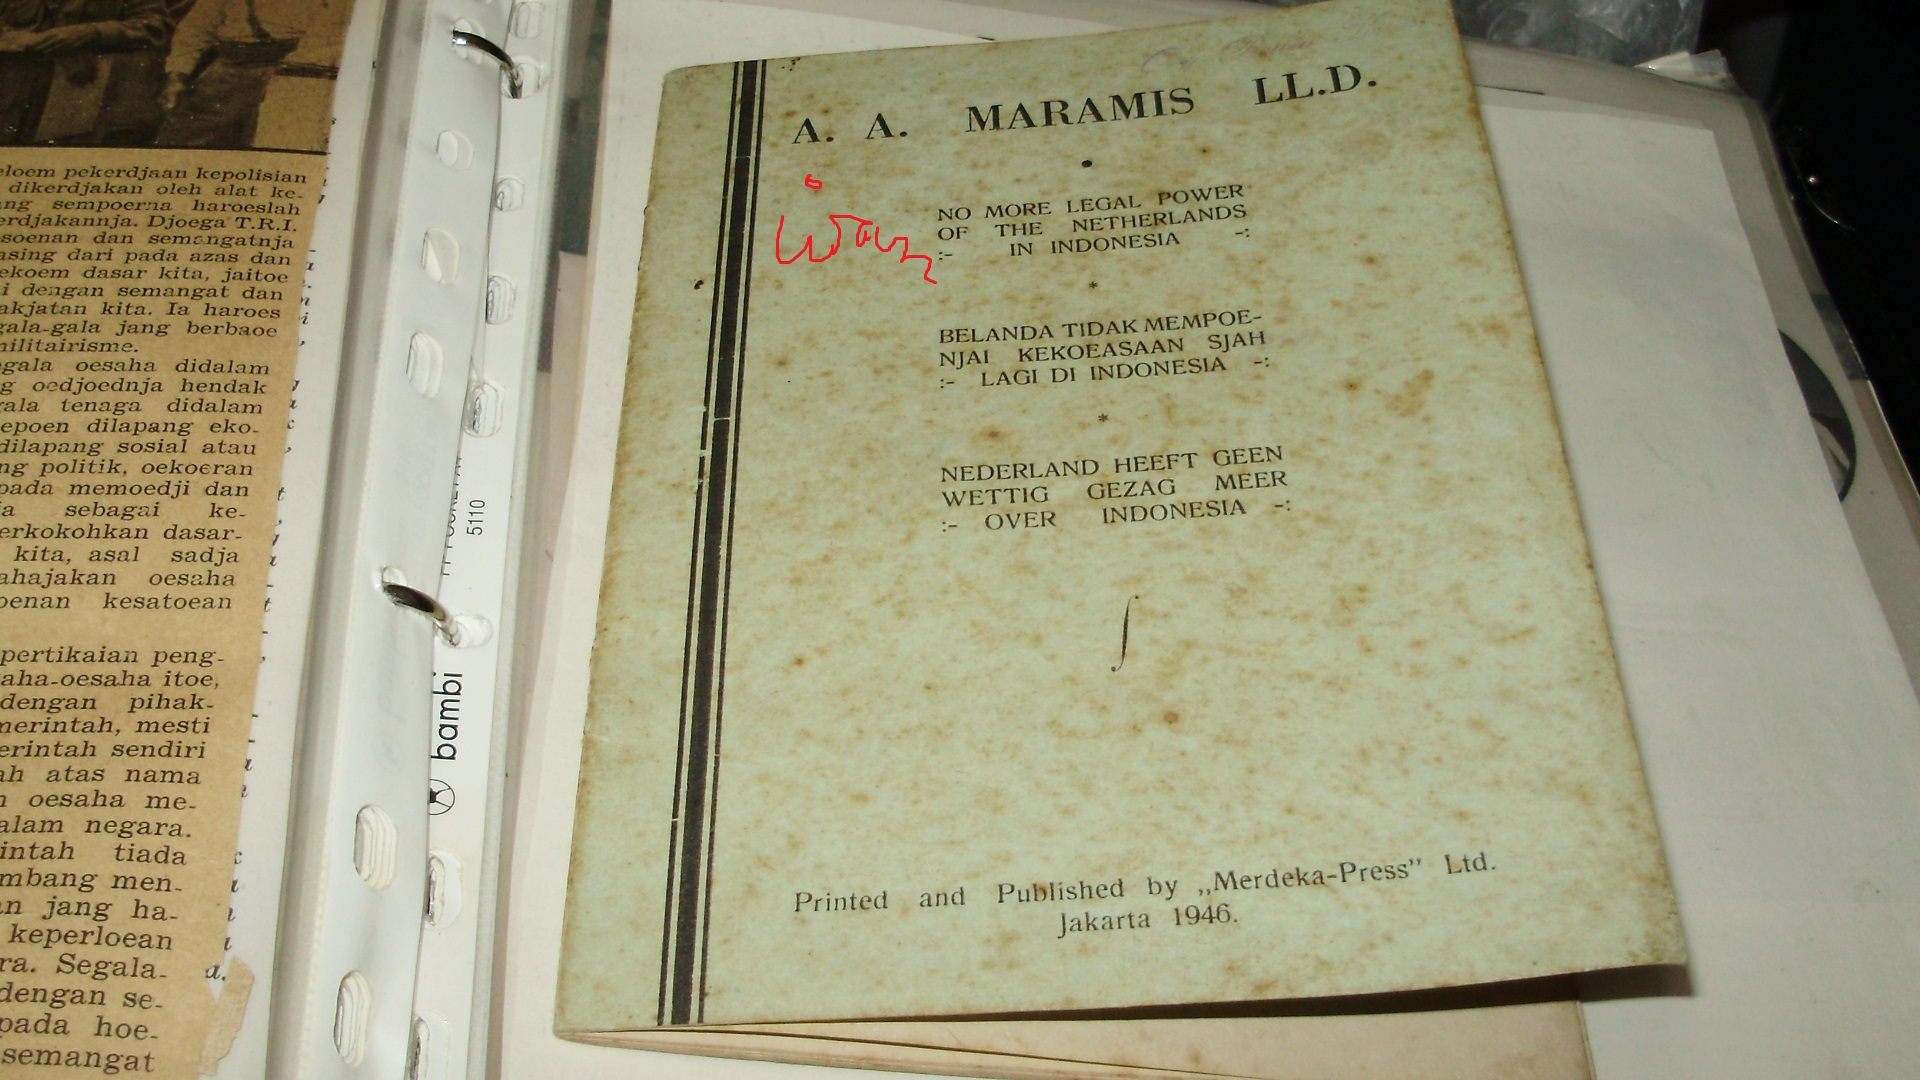 Indonesia Indepenedence Revolution And War 1946 25 Rupiah 1943 Nica Ekonomis No